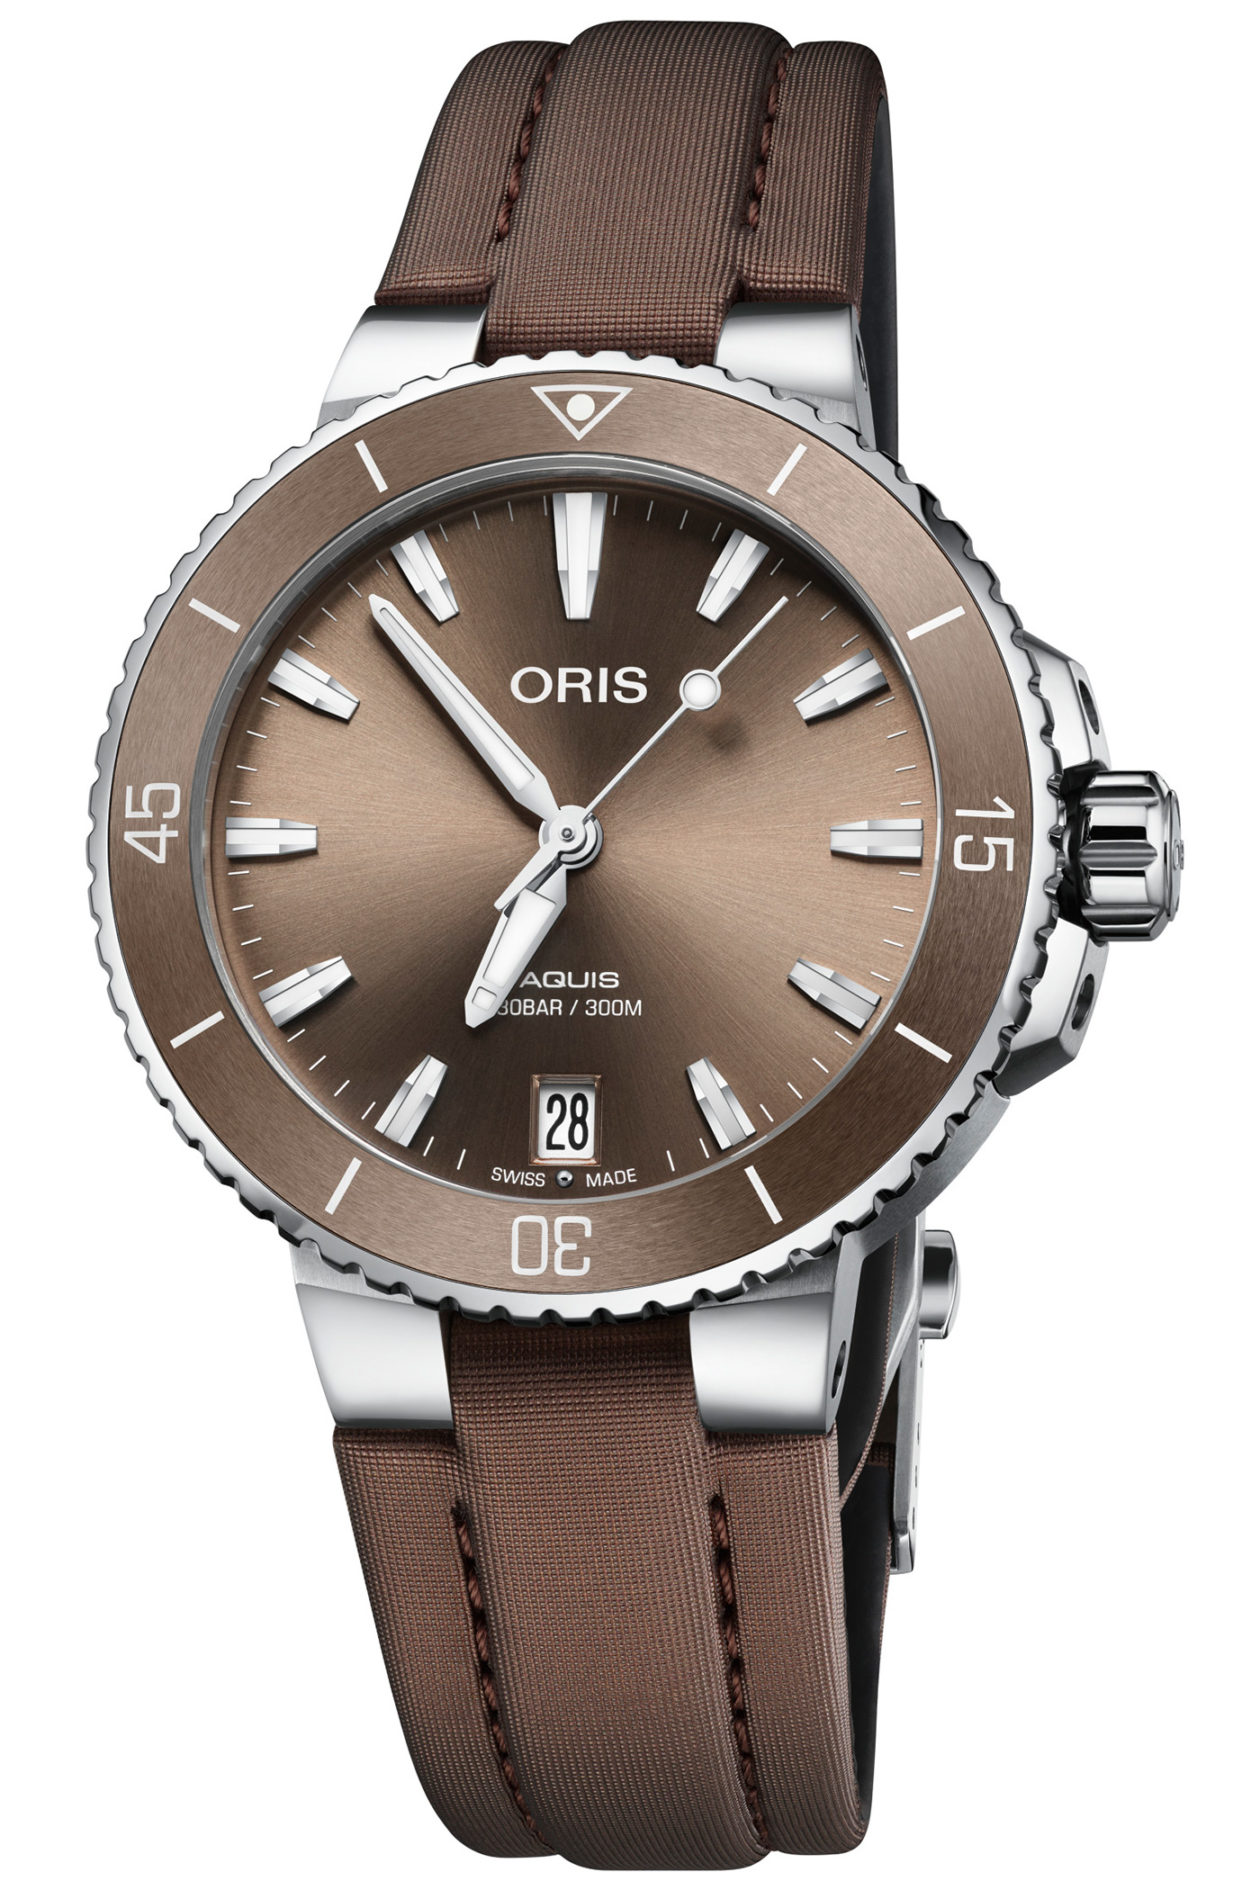 Oris Aquis Date 36,50 mm